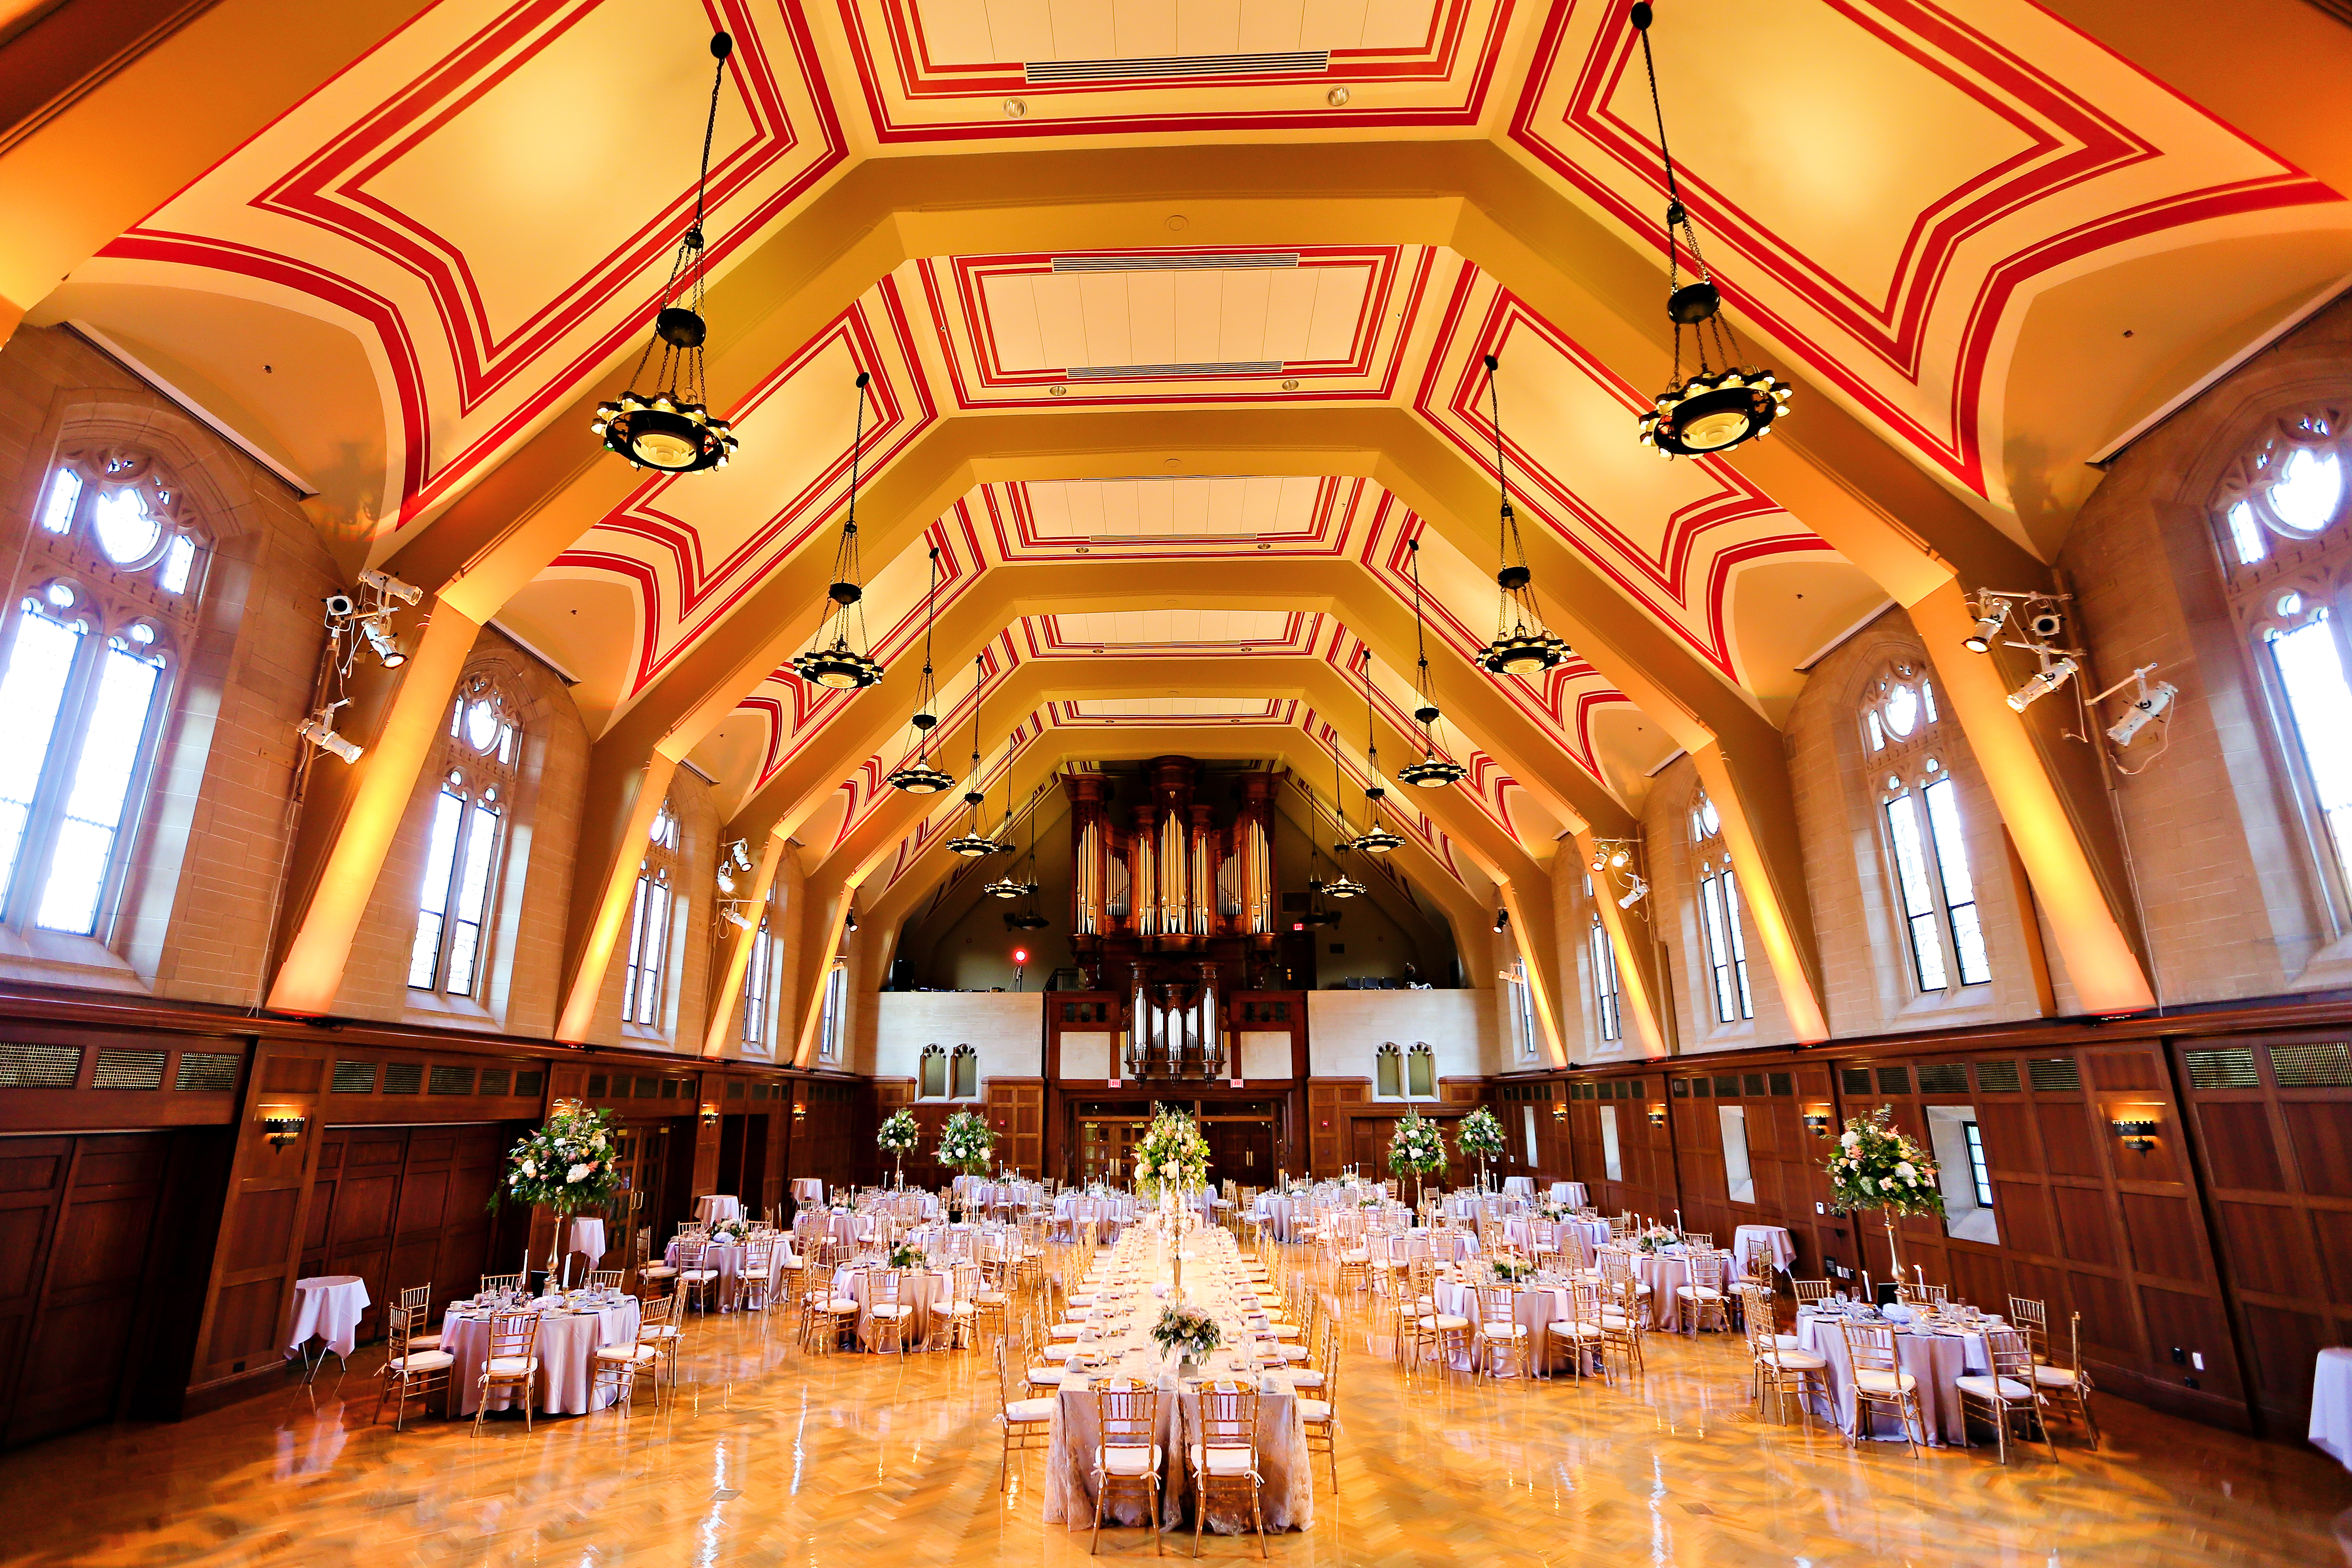 252 meaghan matt indiana university wedding